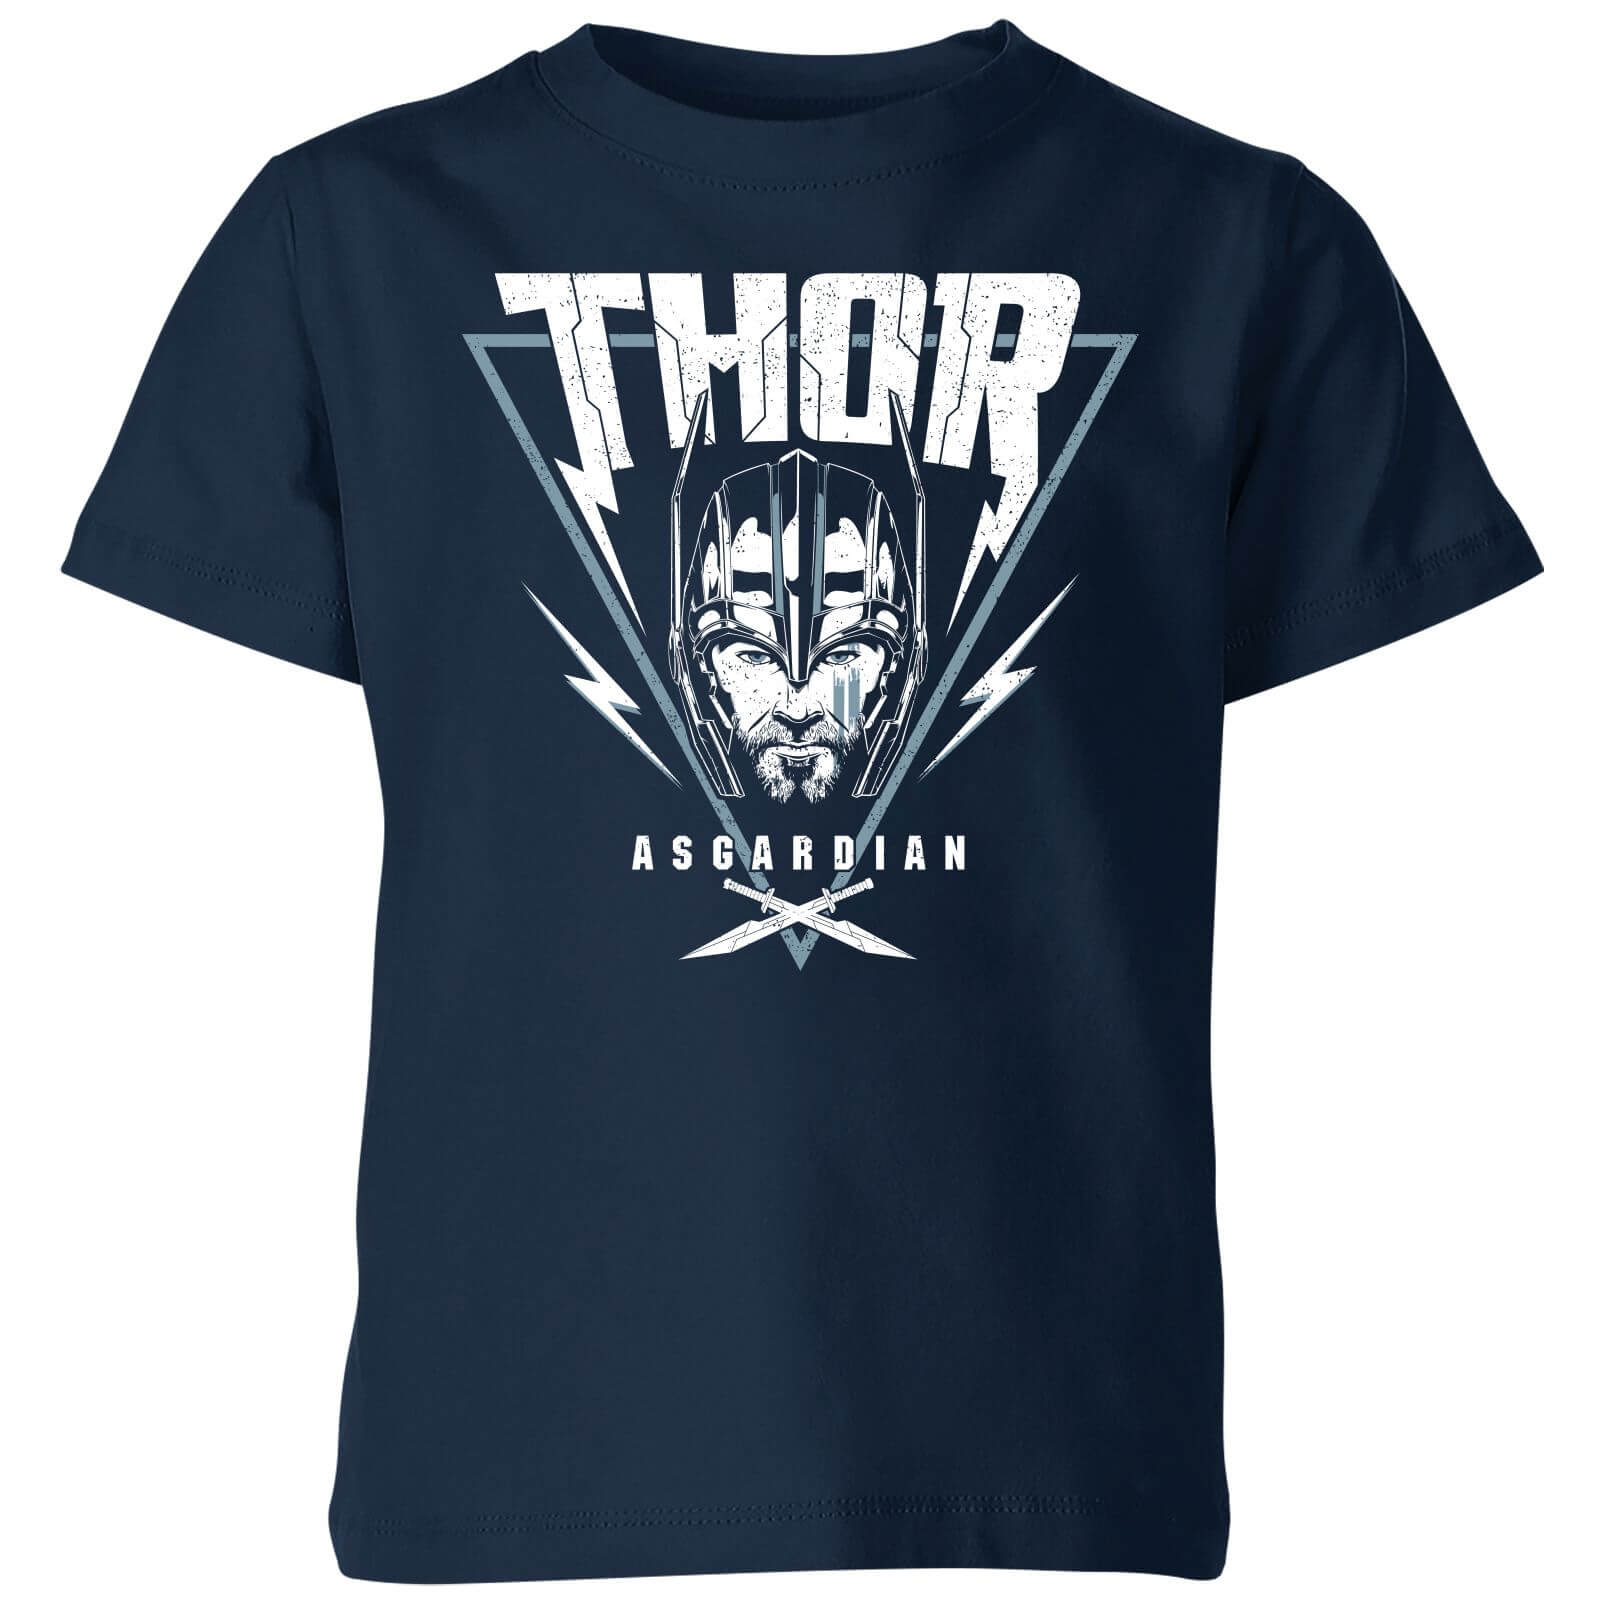 OfferteWeb.click 54-t-shirt-marvel-thor-ragnarok-asgardian-triangle-navy